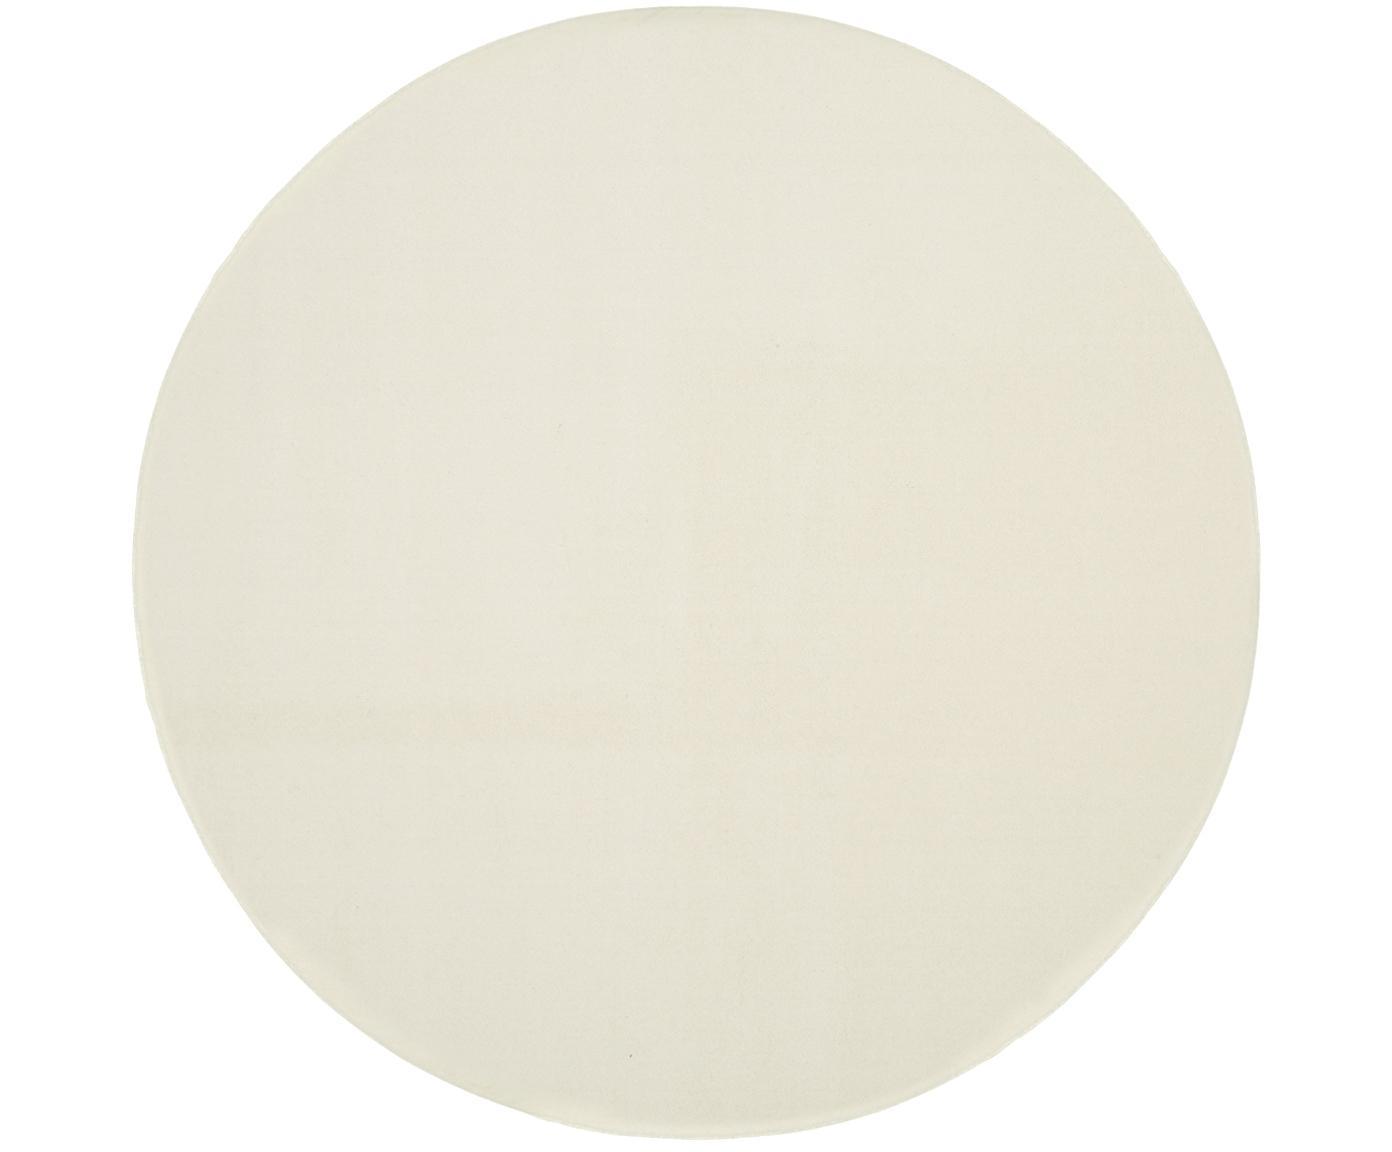 Rond wollen vloerkleed Ida in beige, Bovenzijde: wol, Onderzijde: polyester, Beige, Ø 120 cm